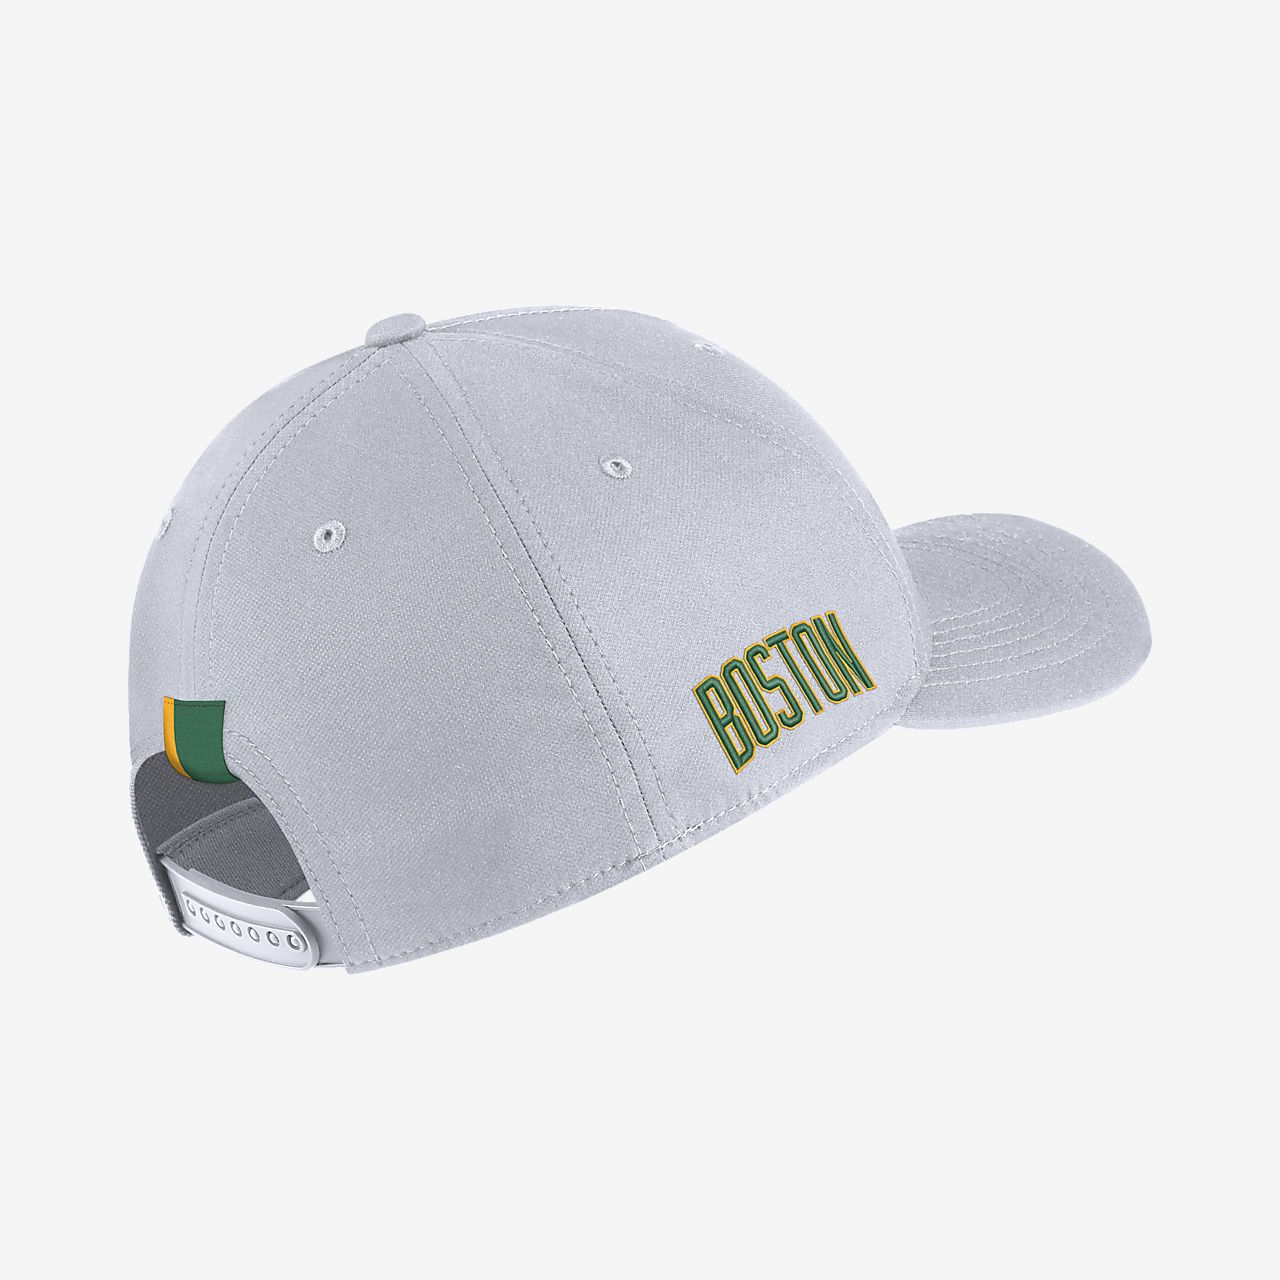 4f1579afd582ba Boston Celtics City Edition Nike AeroBill Classic99 NBA Hat. Nike.com